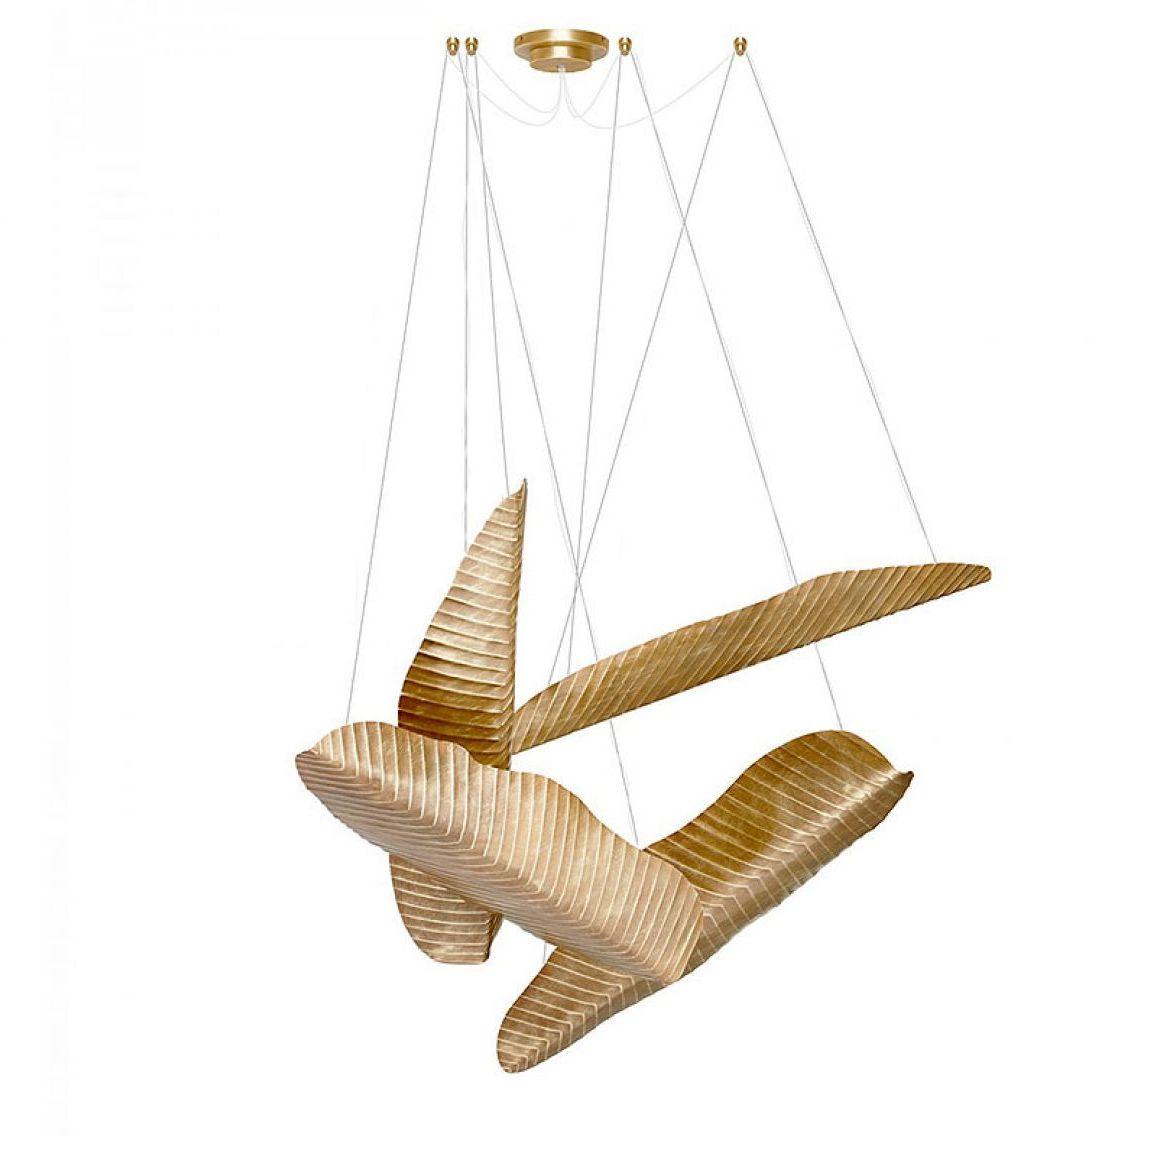 Bananas suspension lamp